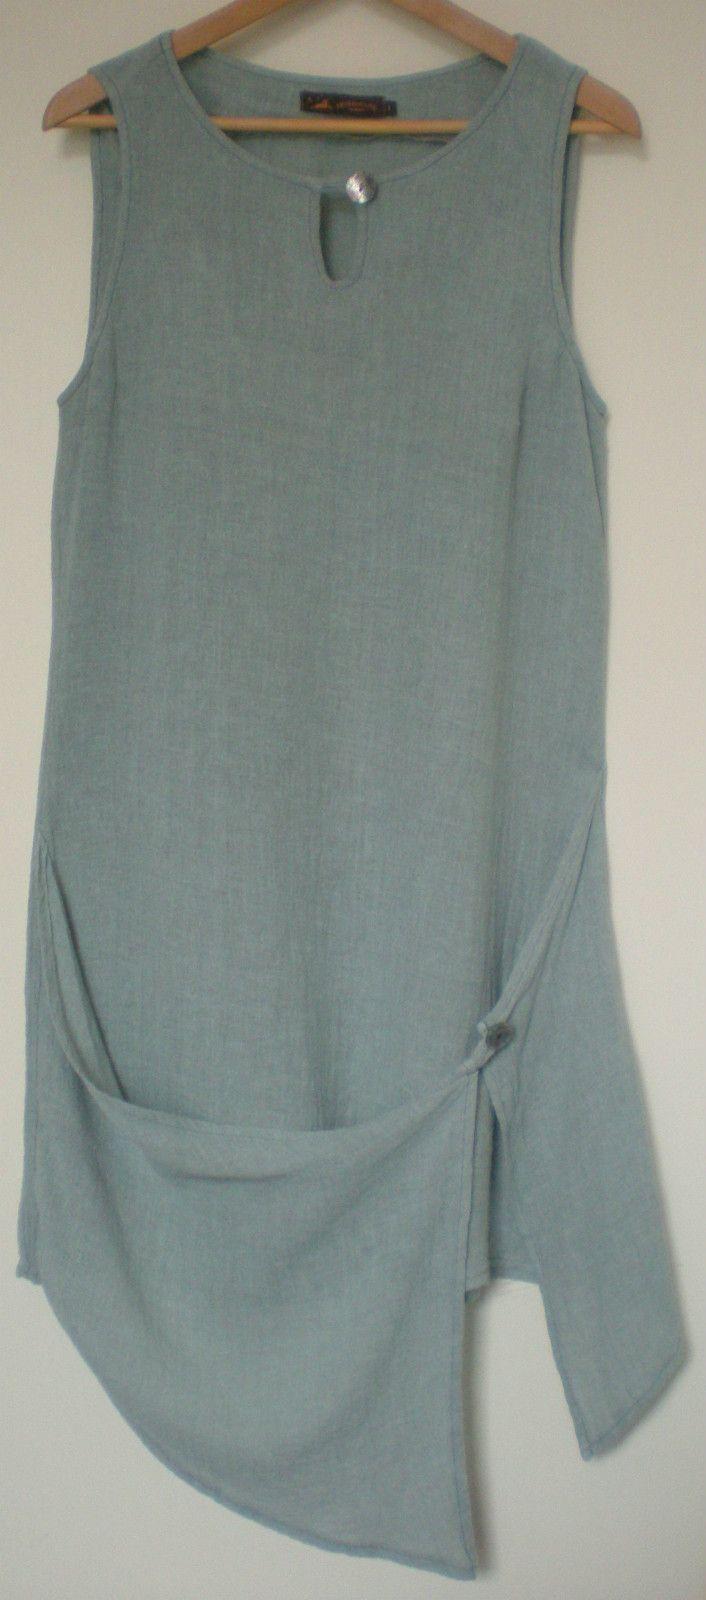 White pinafore apron ebay - M 12 Apron Front Asymmetric Lagenlook